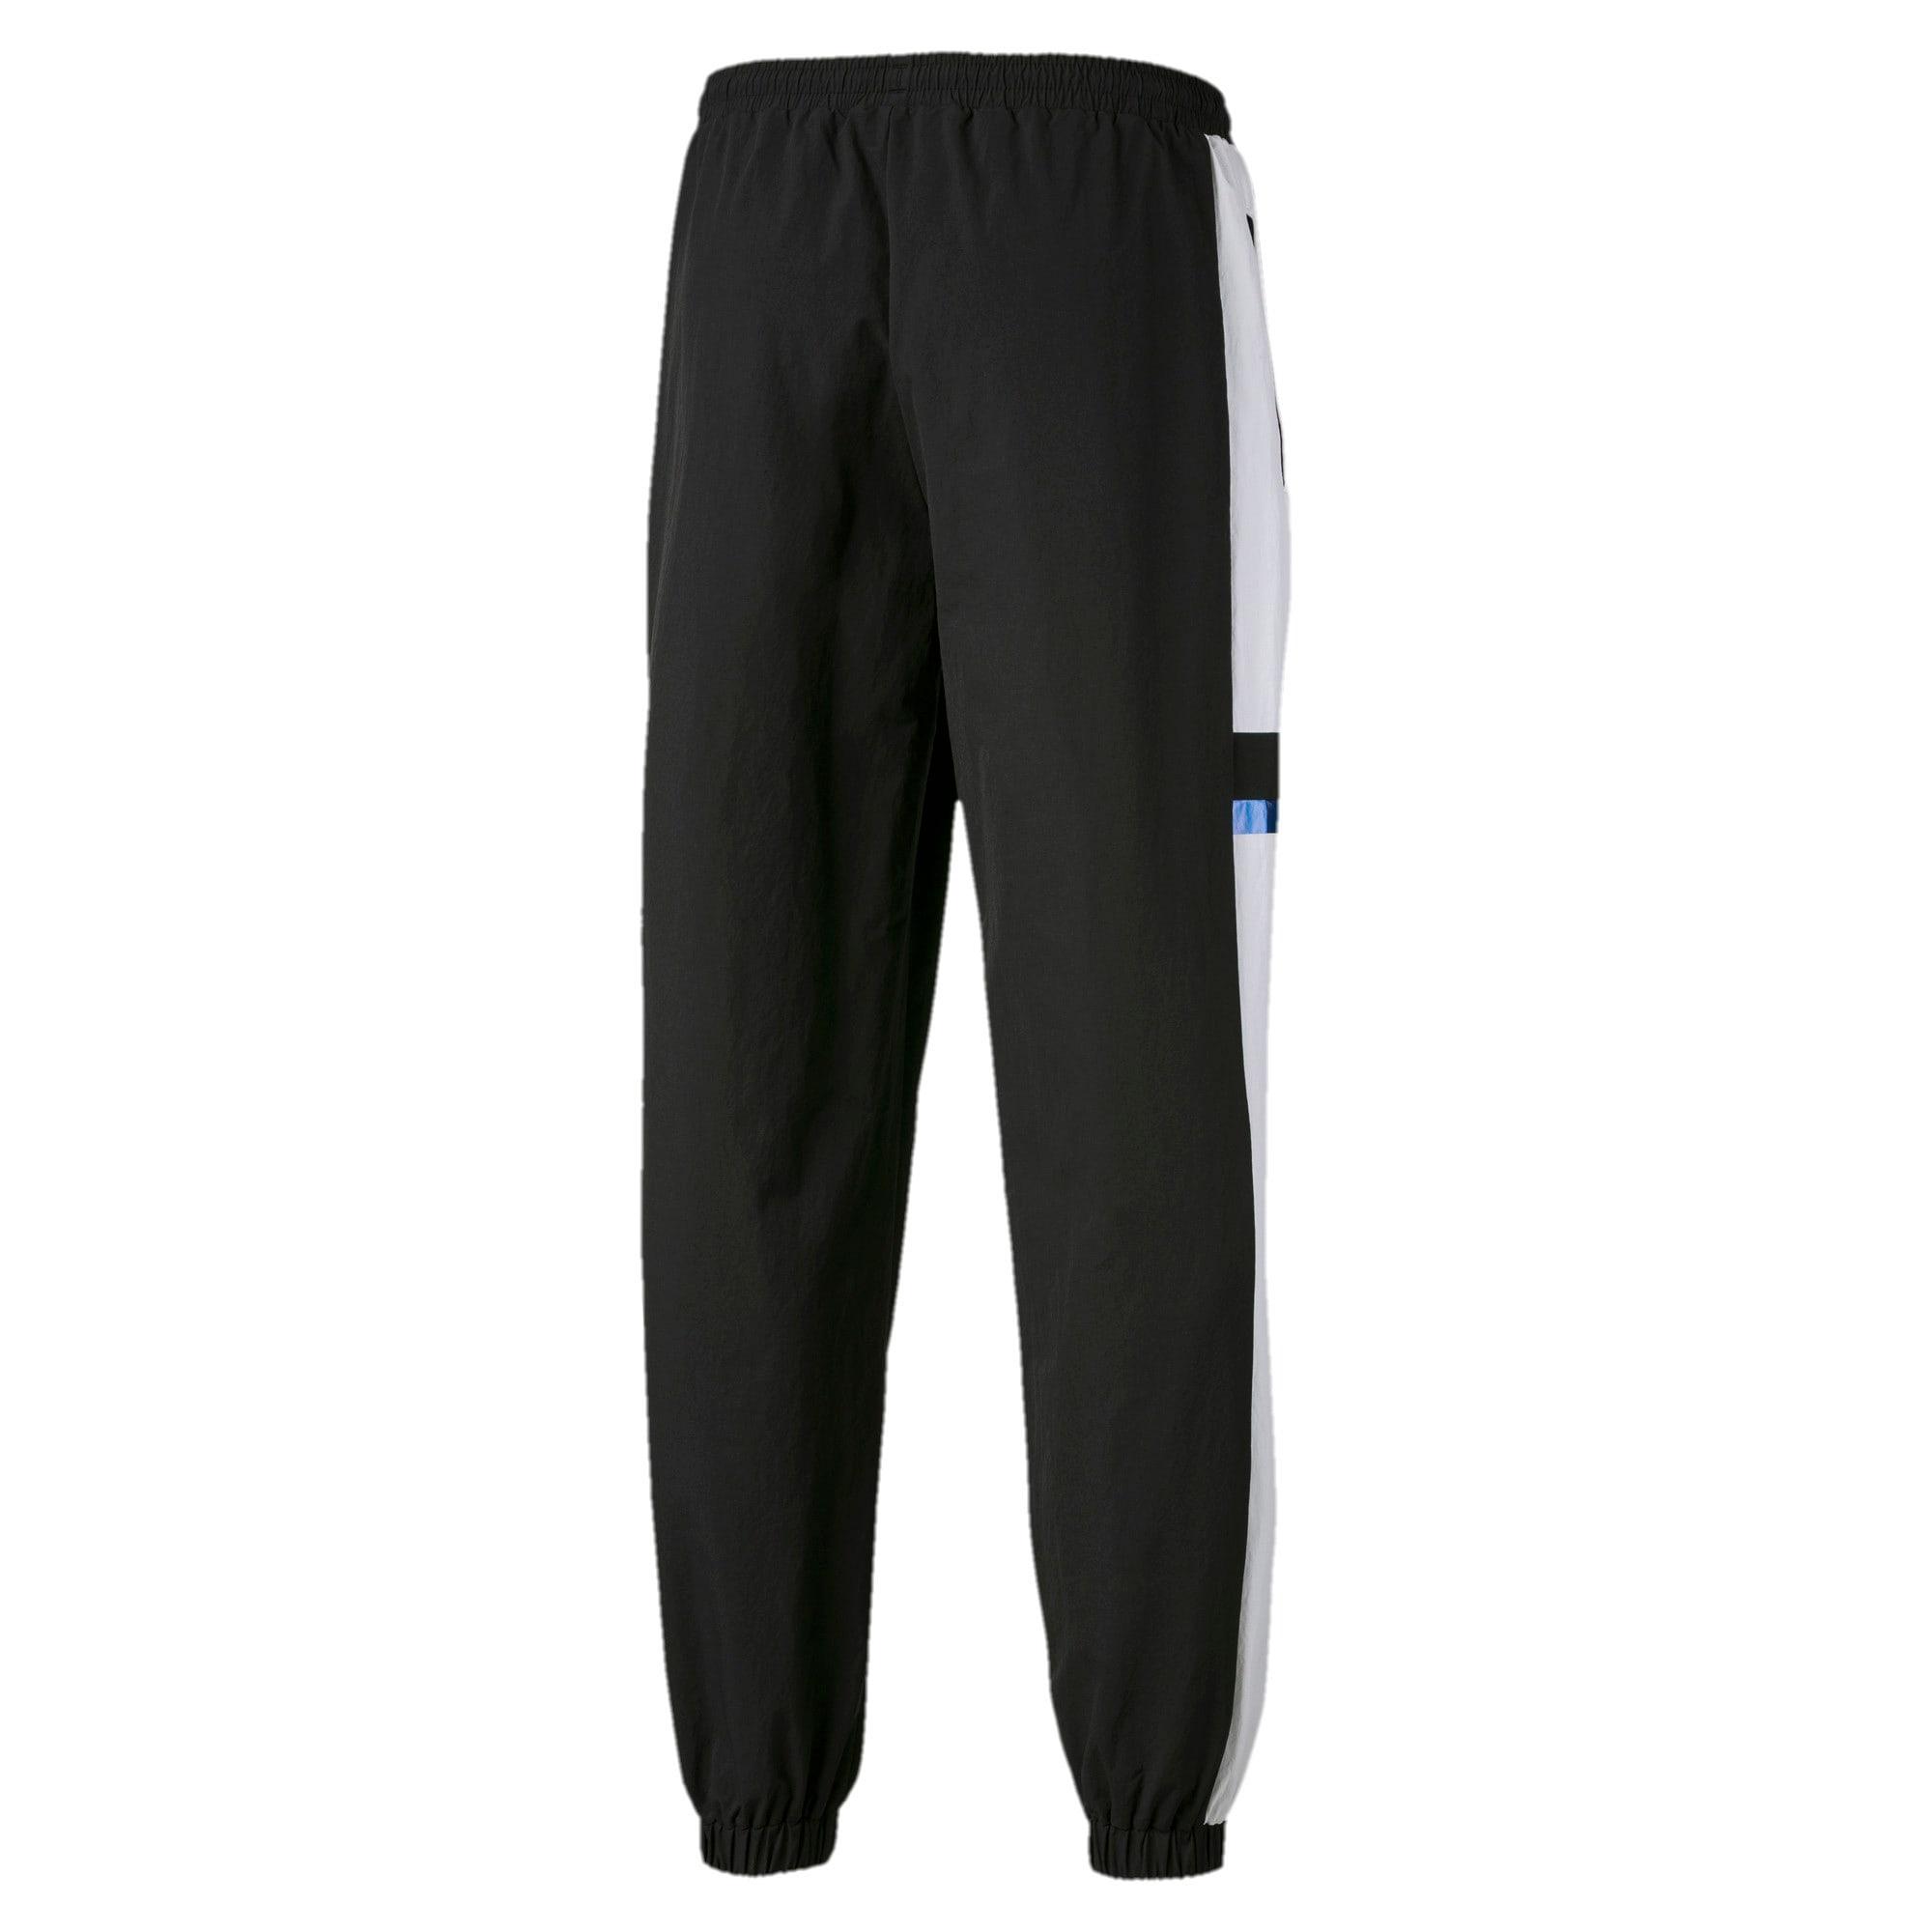 Thumbnail 2 of BMW M Motorsport Street Men's Woven Pants, Puma Black, medium